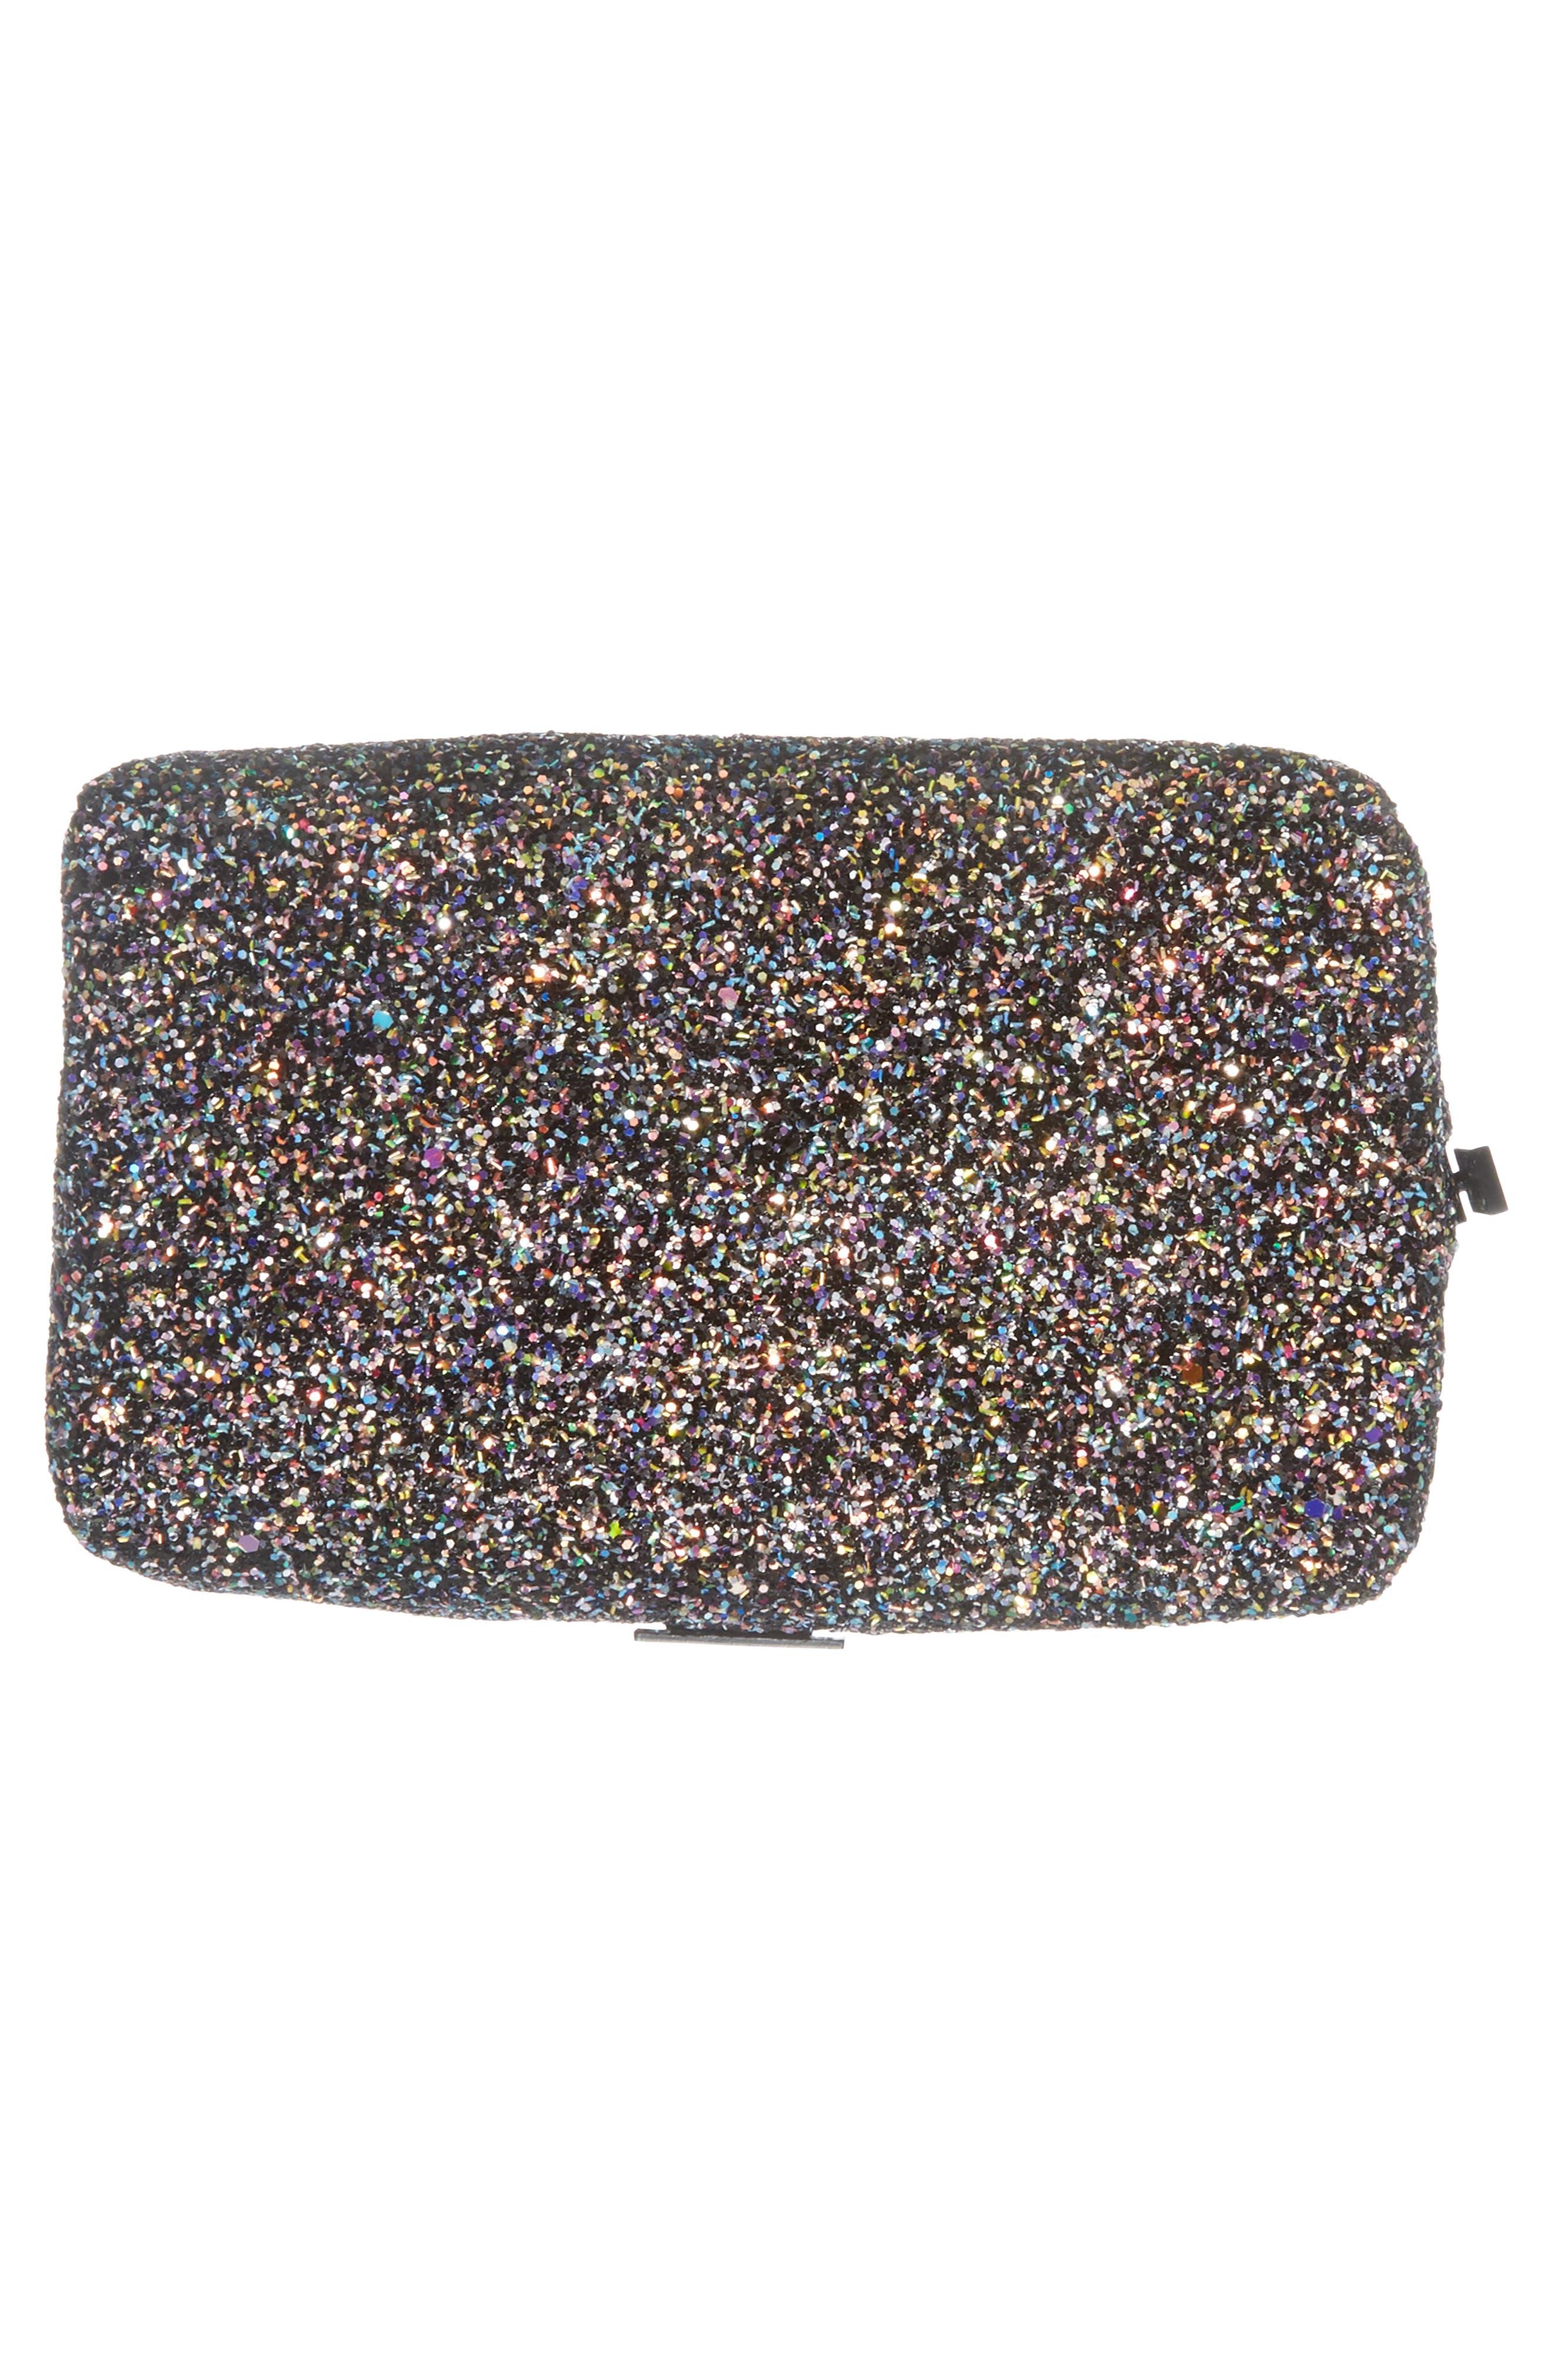 Skinny Dip Liquorice Glitter Cosmetics Bag,                             Alternate thumbnail 5, color,                             No Color